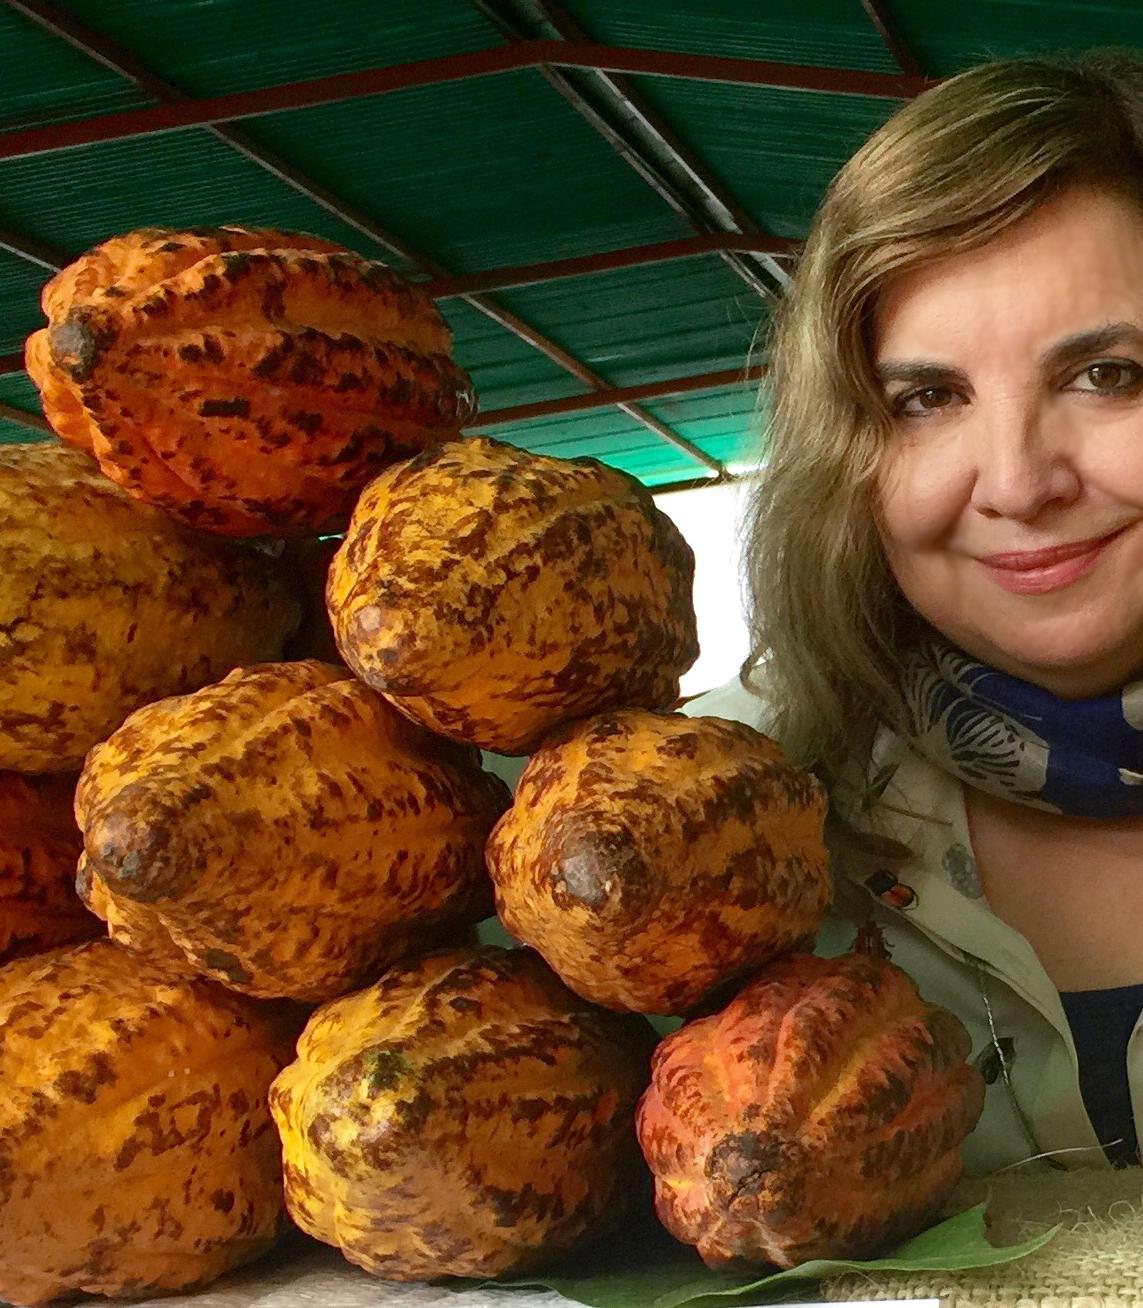 Maricel Presilla, Special Guest James Beard Award Winner & Chocolate Connoisseur